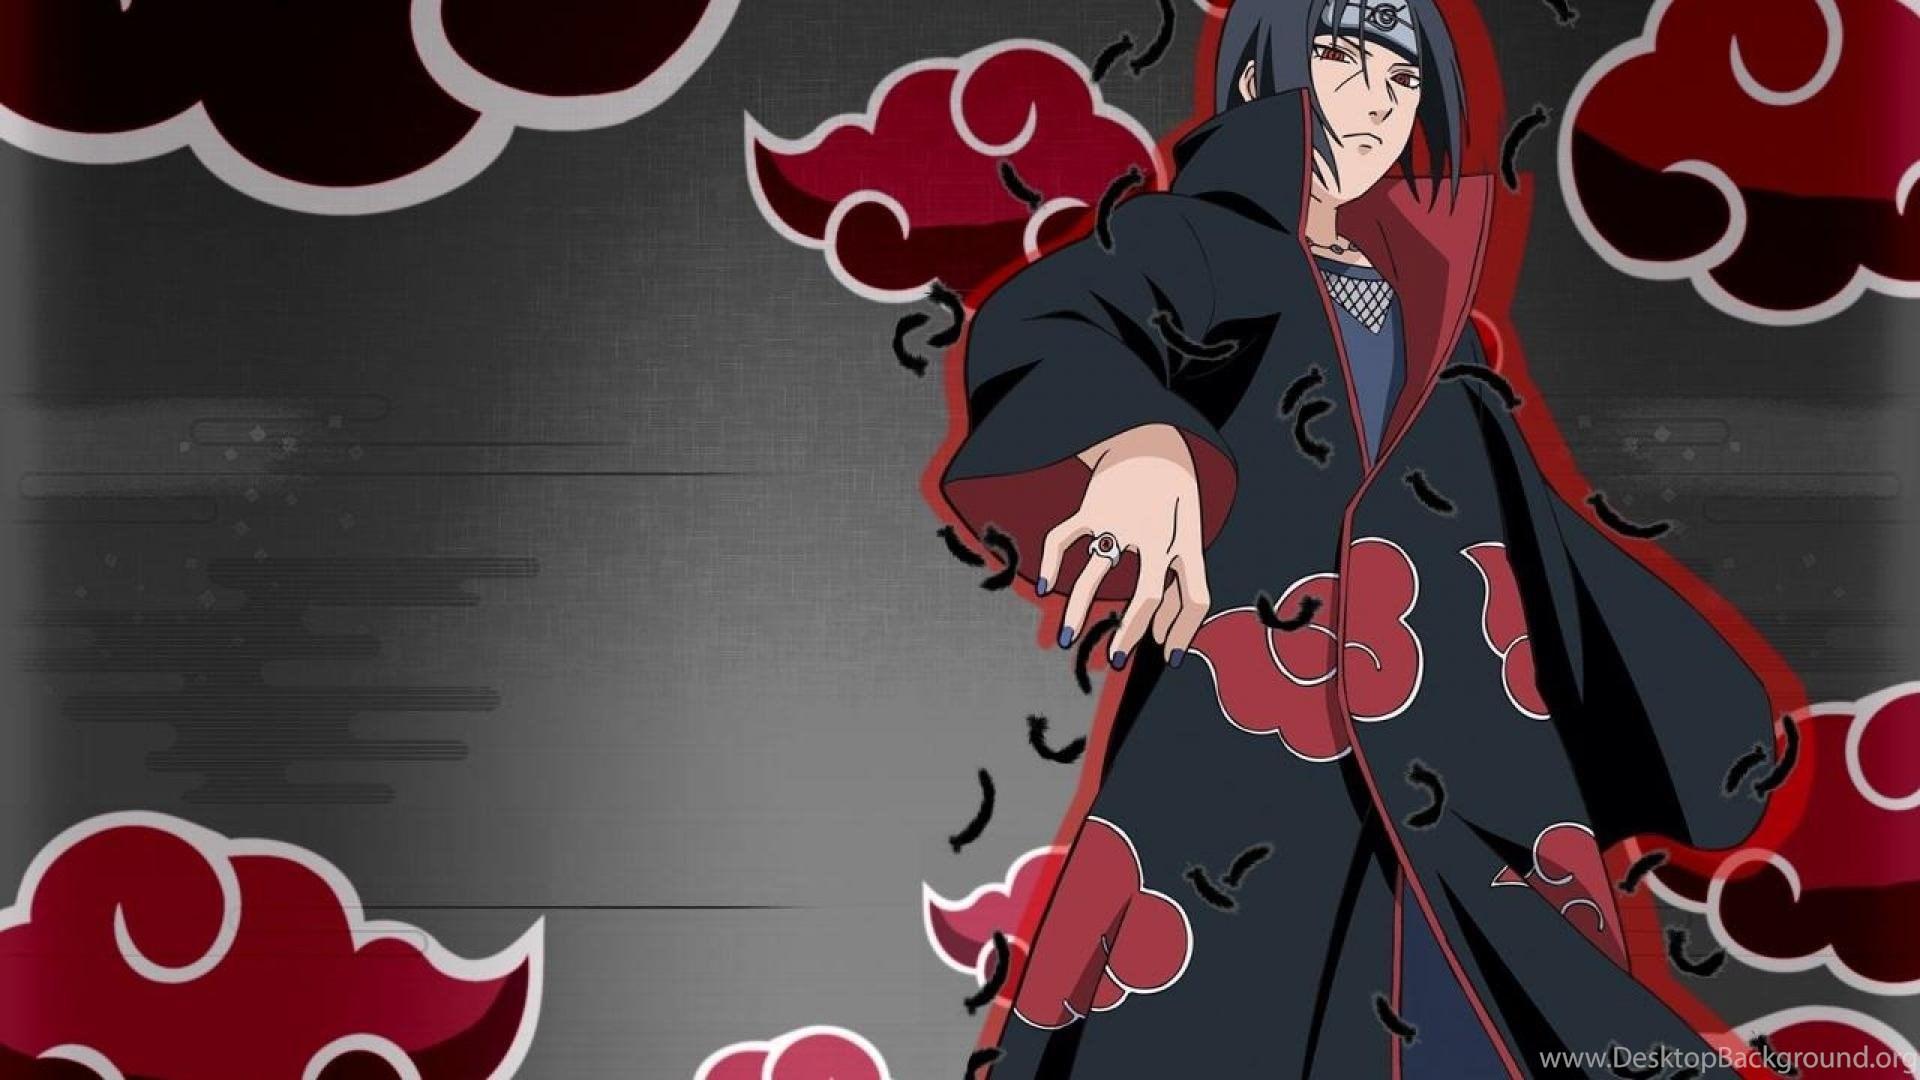 Itachi Uchiha Naruto Madara Uchiha Anime 1920x1080 Hd Desktop Background